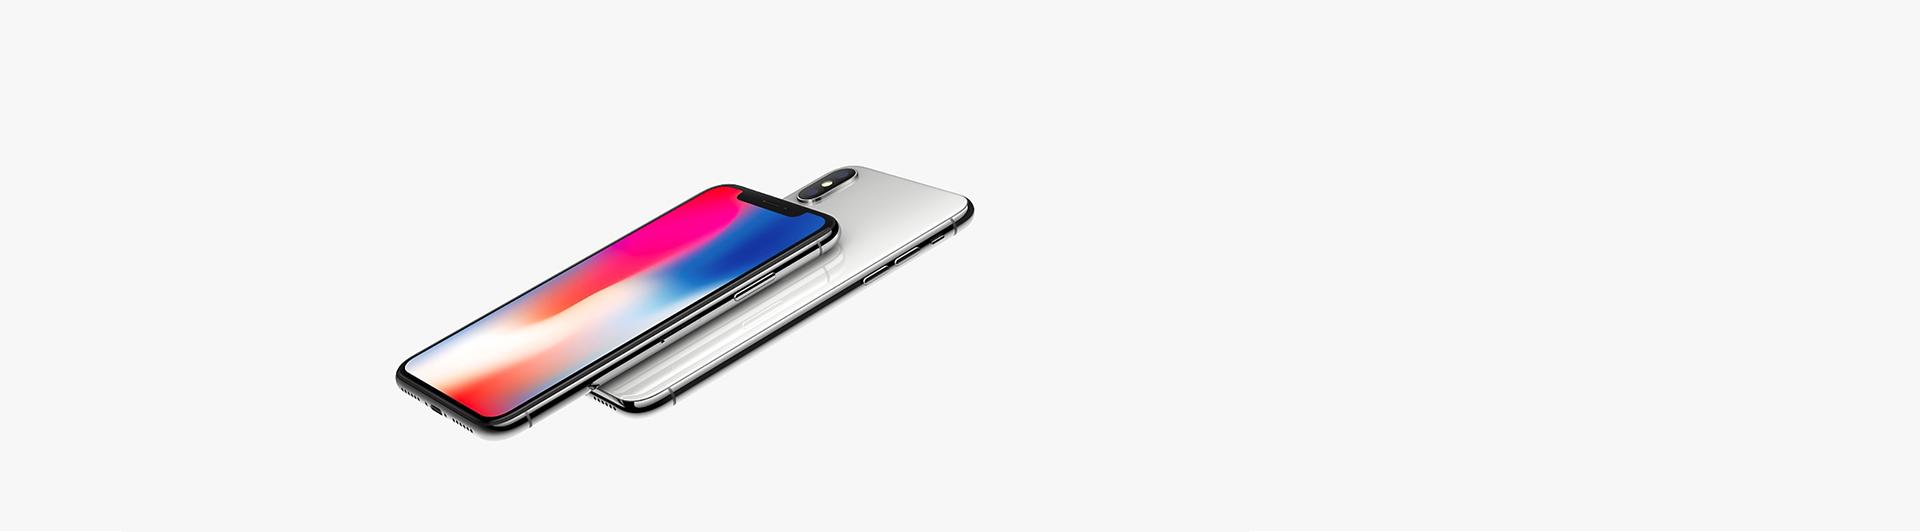 IPHONE X 256GB GRAY